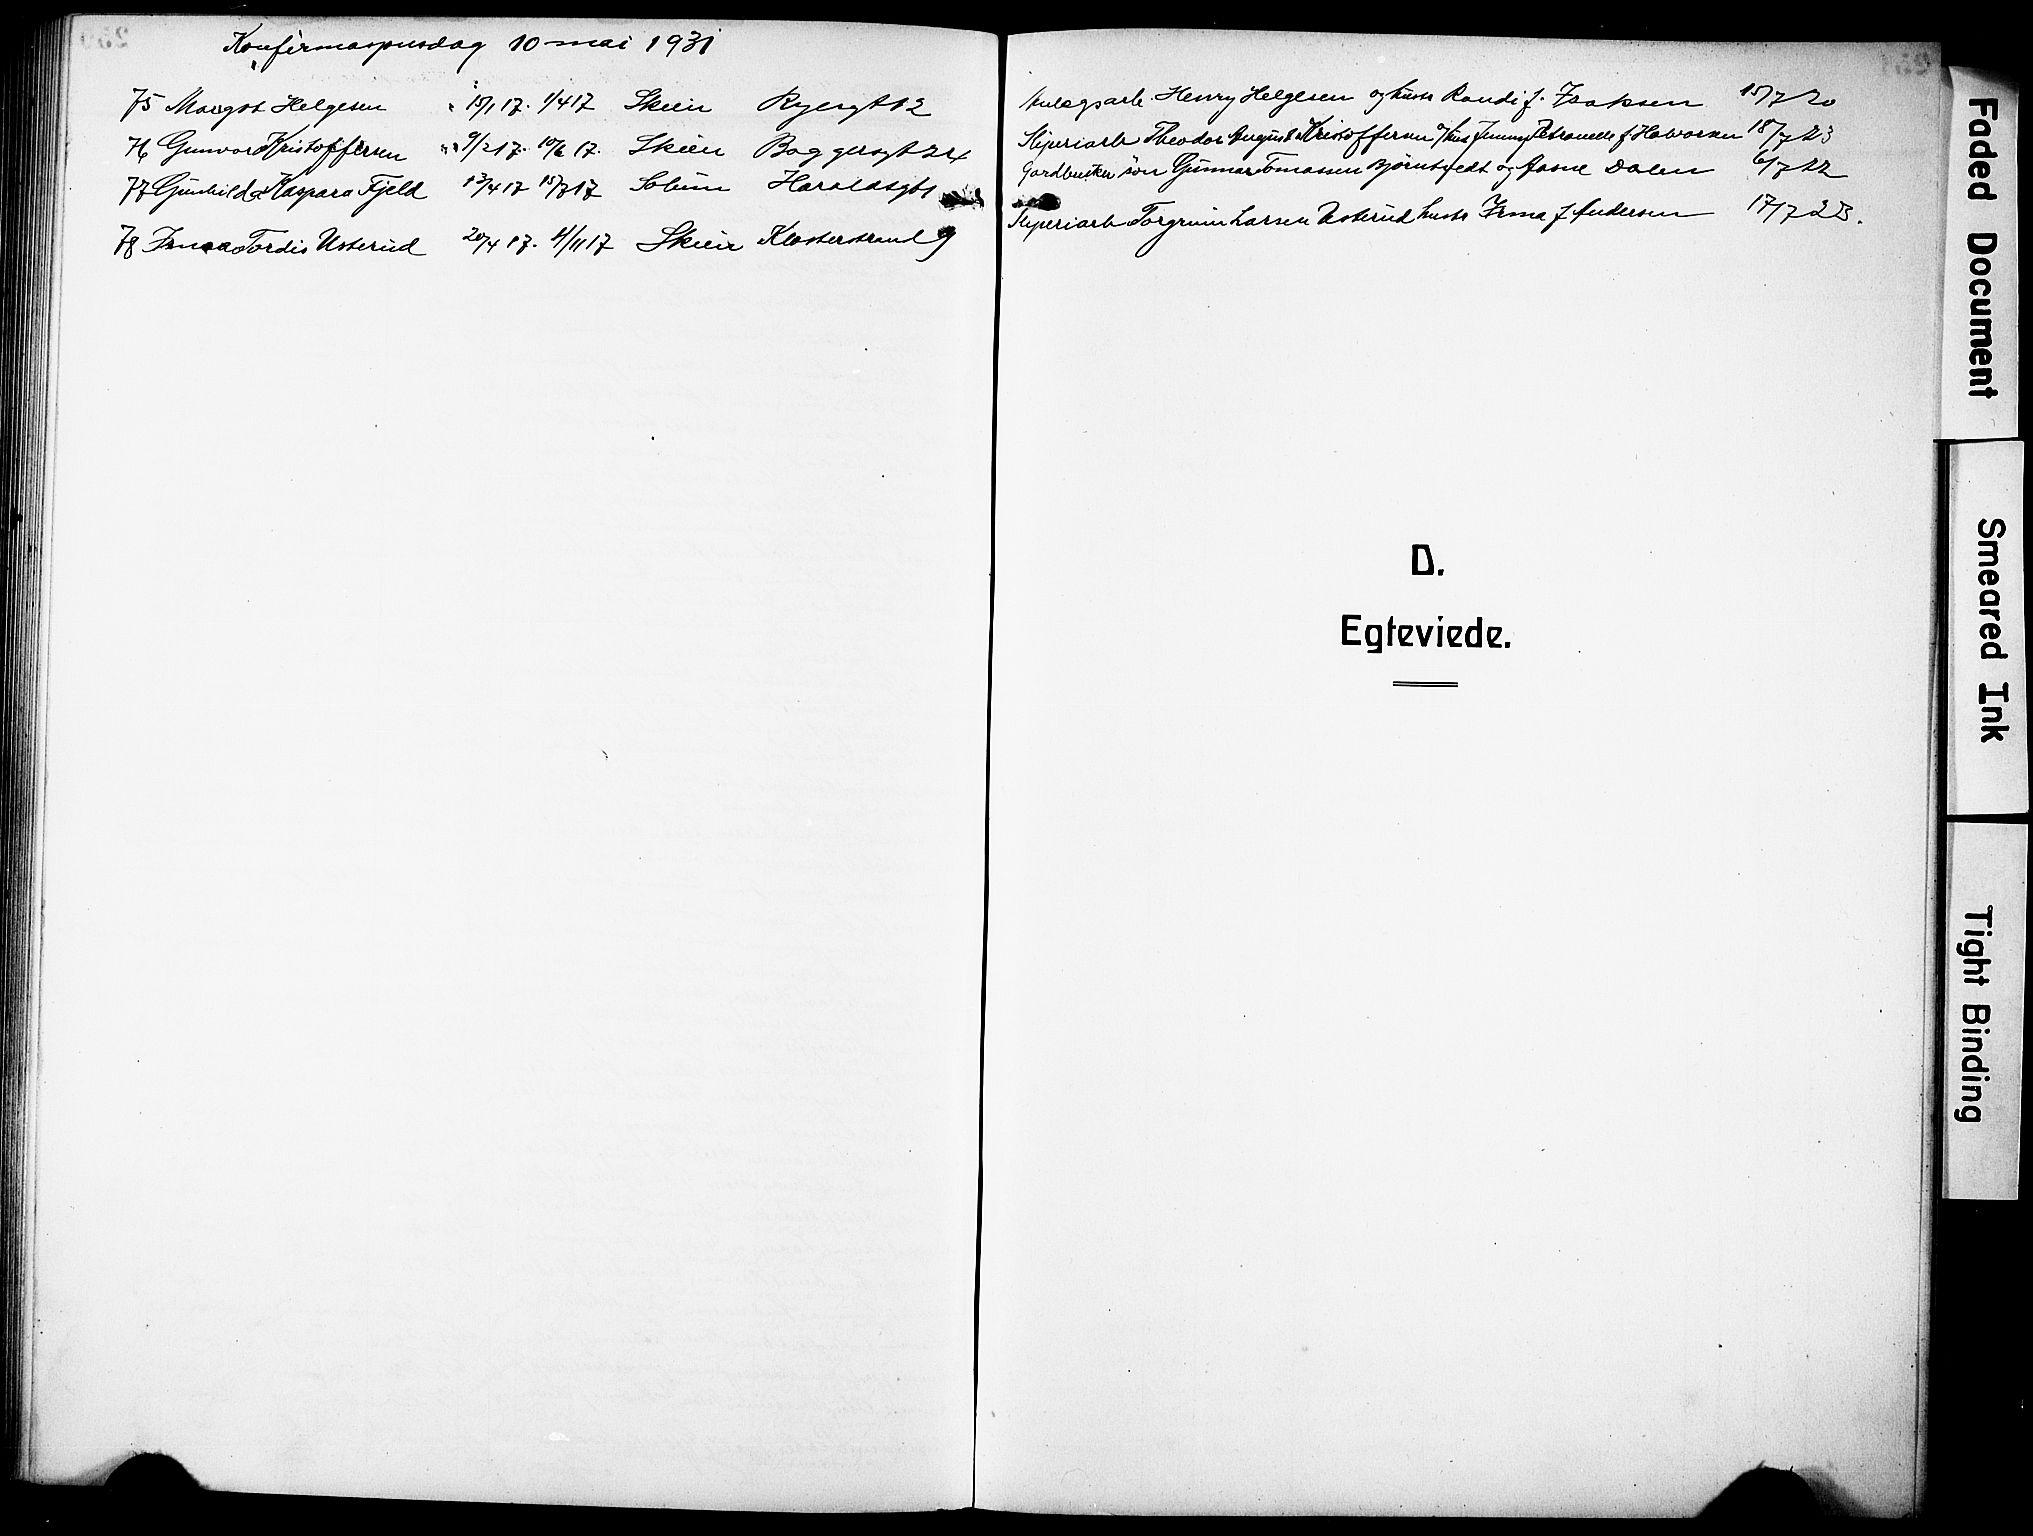 SAKO, Skien kirkebøker, G/Ga/L0010: Klokkerbok nr. 10, 1920-1931